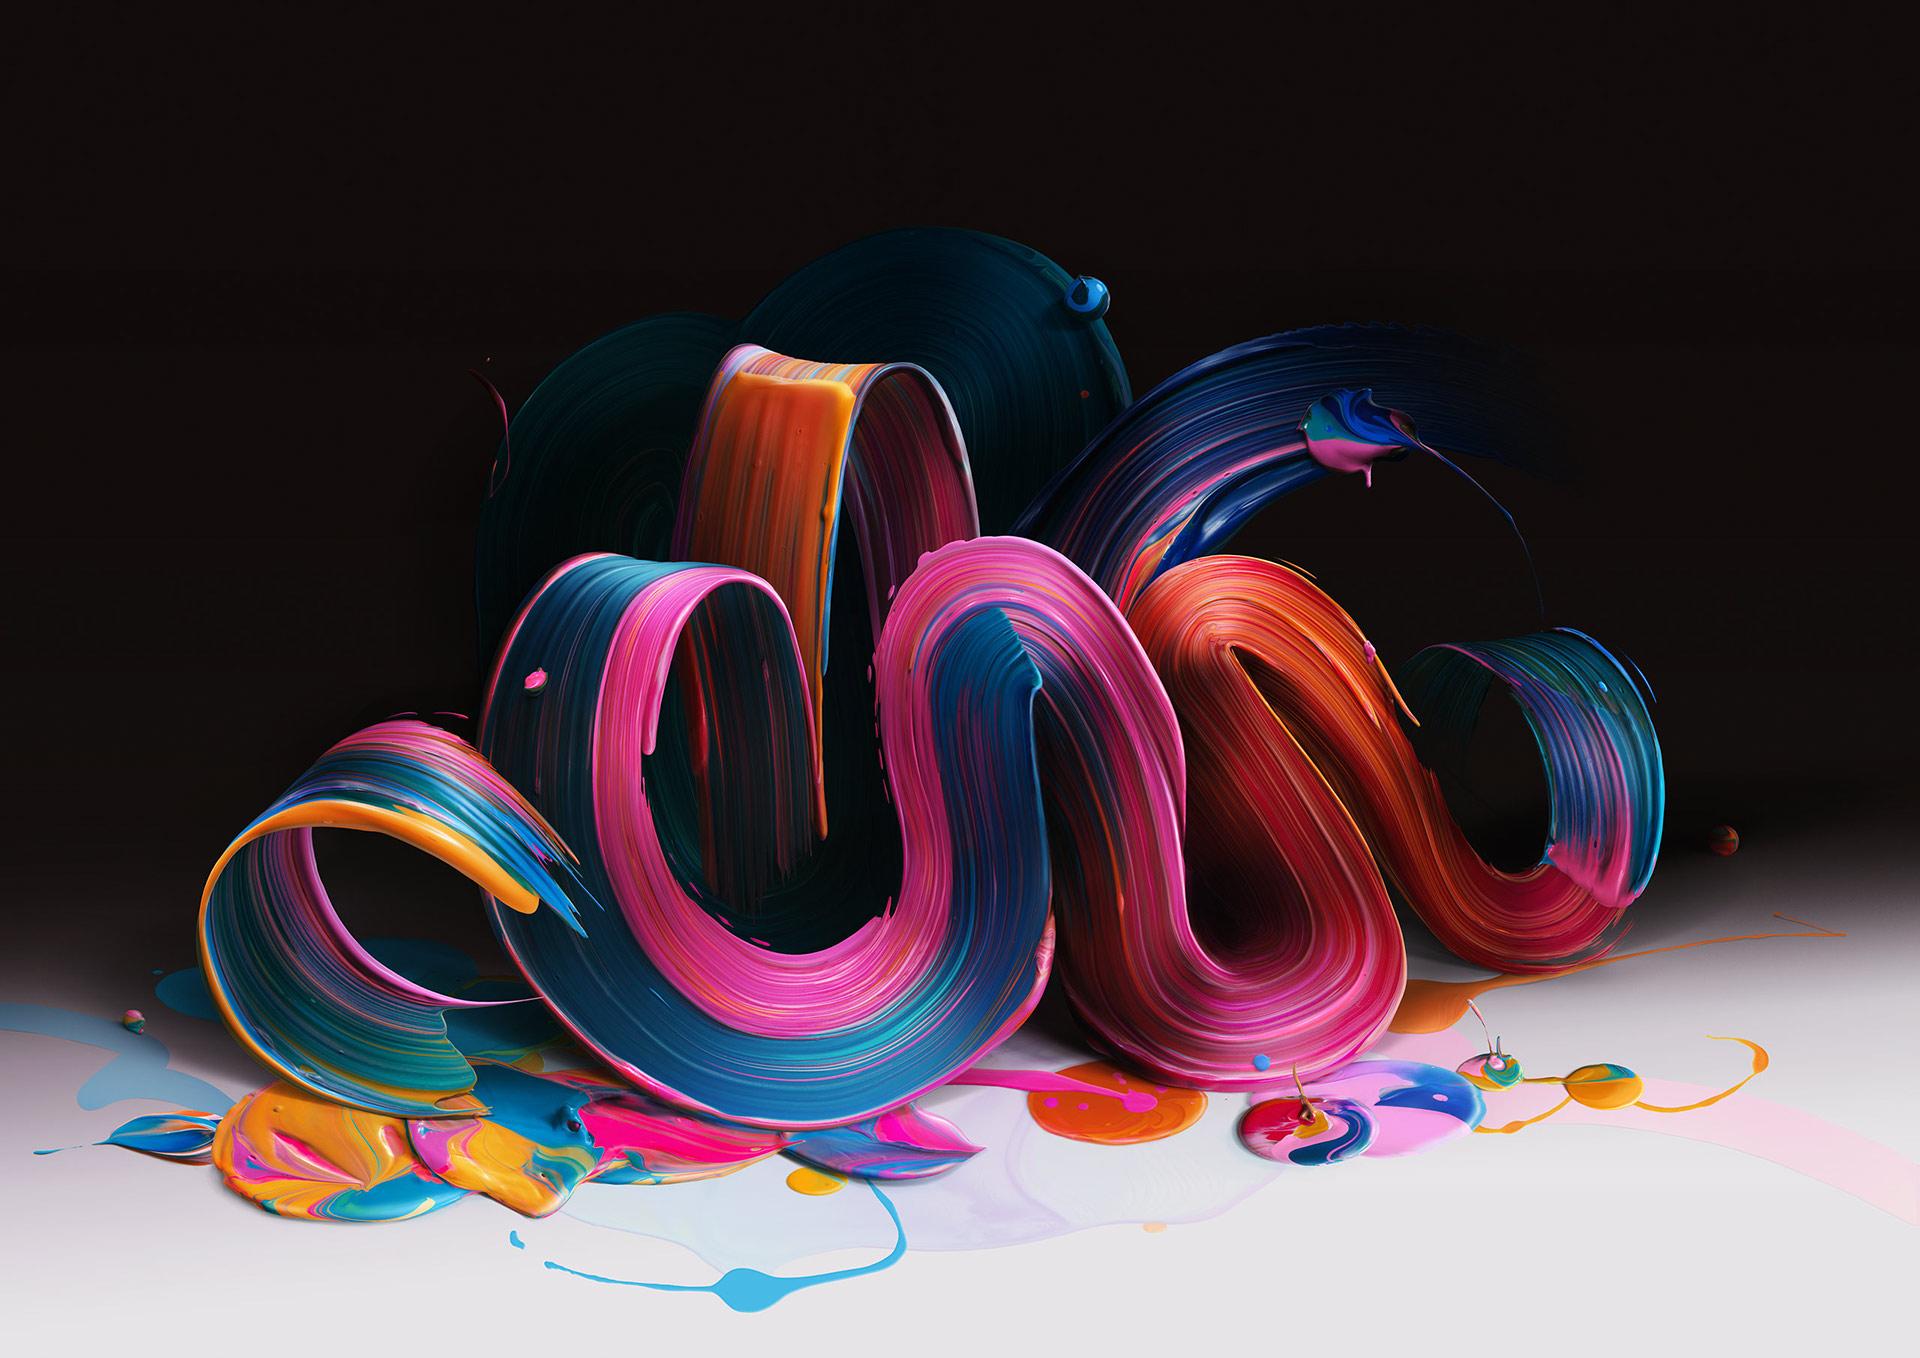 Art Direction & Illustration: Logitech Craft by Pawel Nolbert